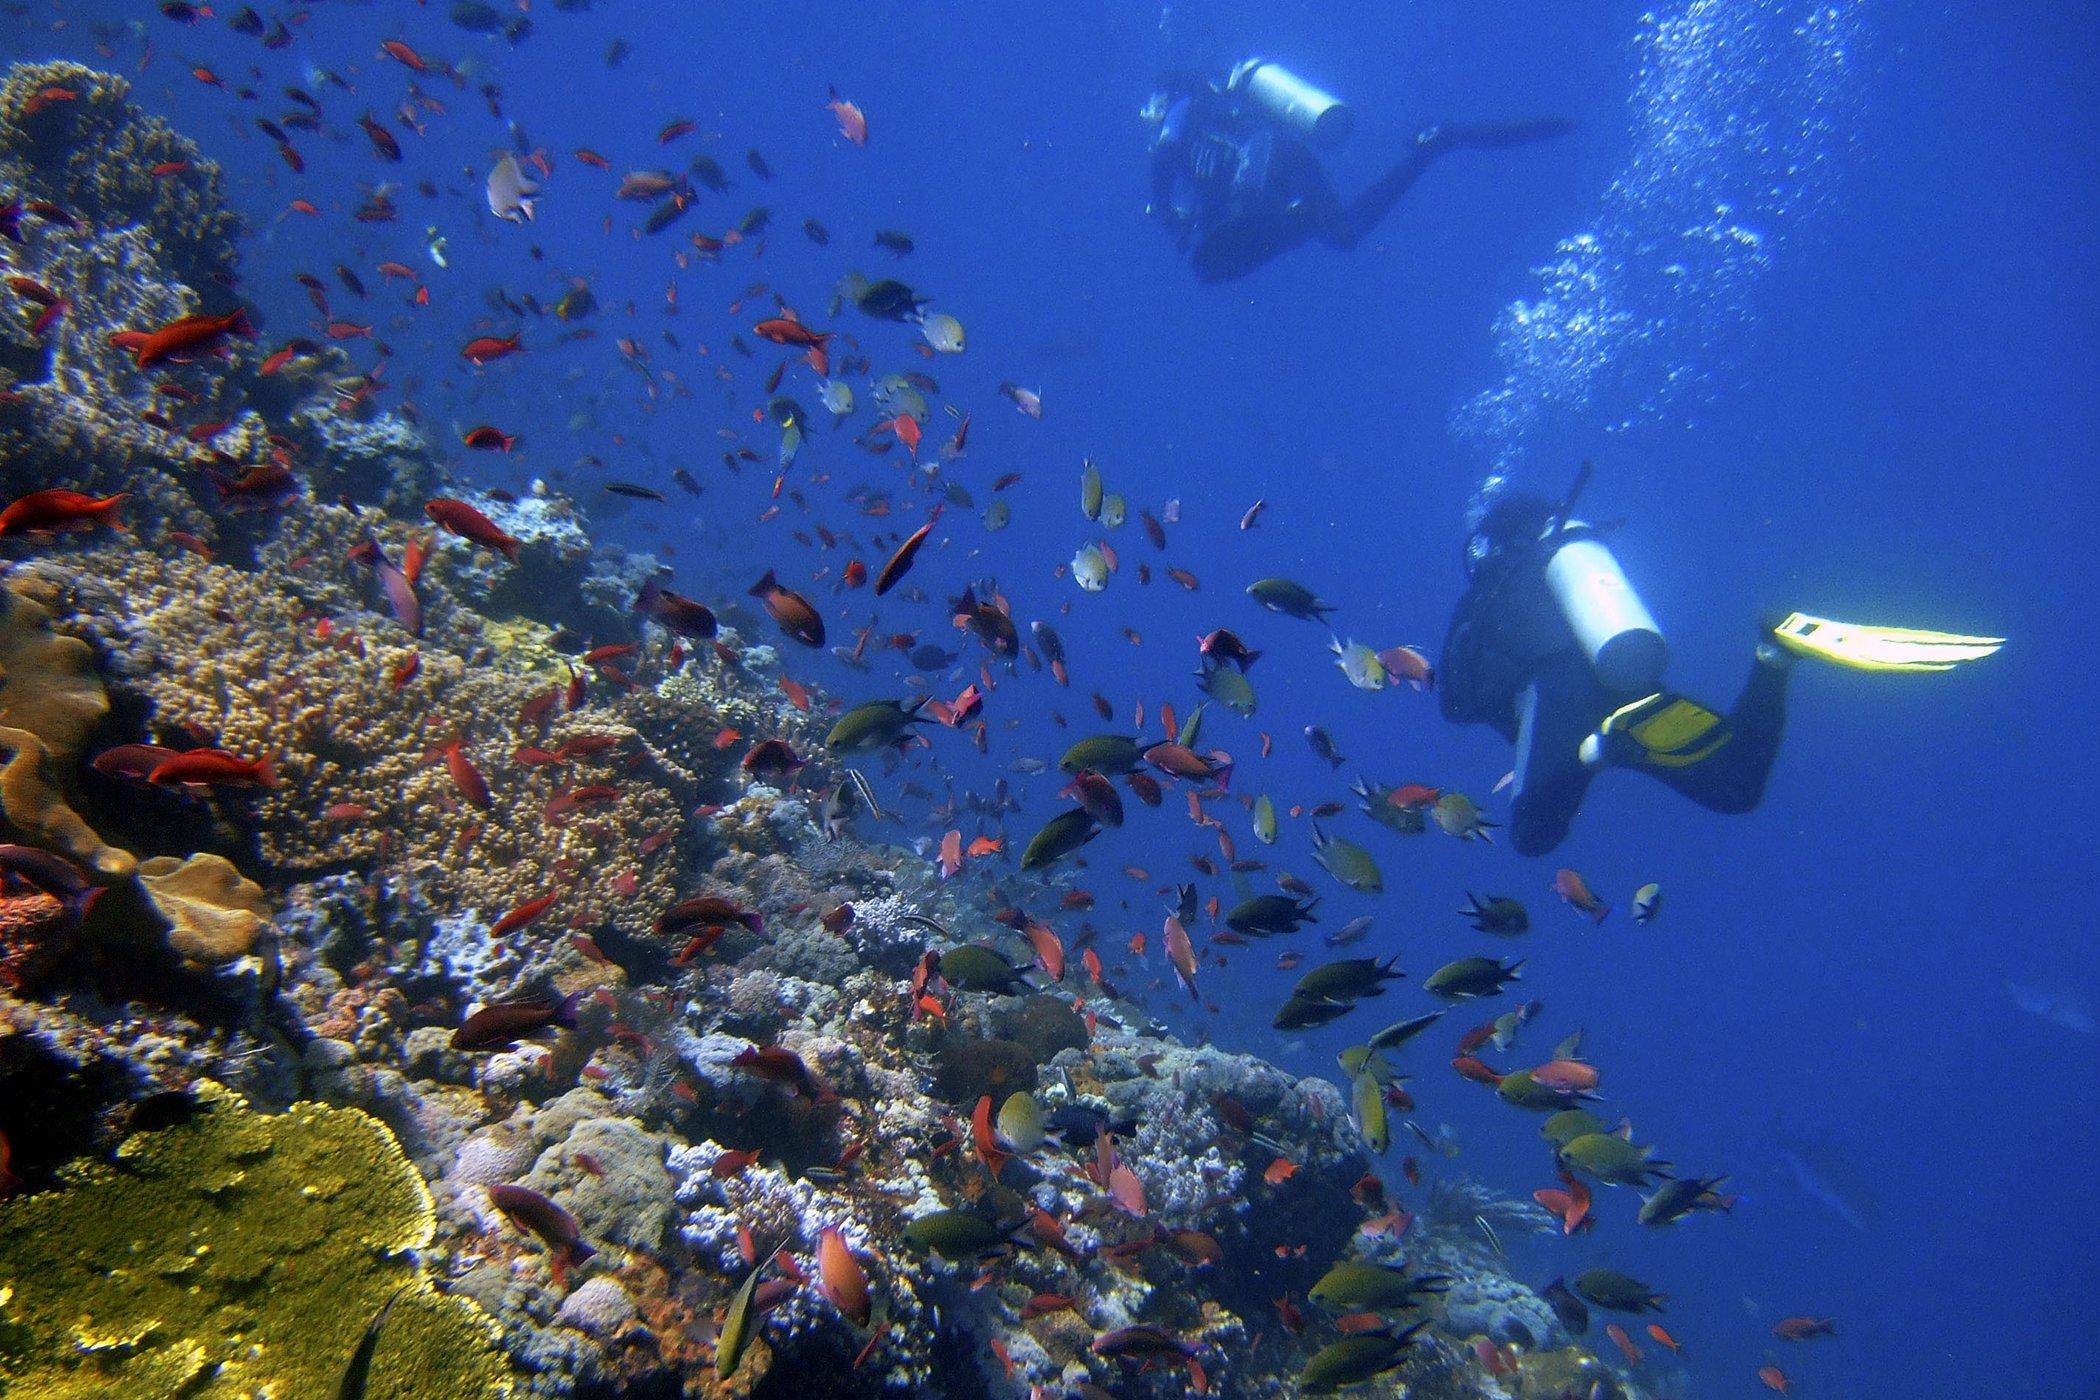 Evironmental-Wins-Protecting-Oceans.jpg